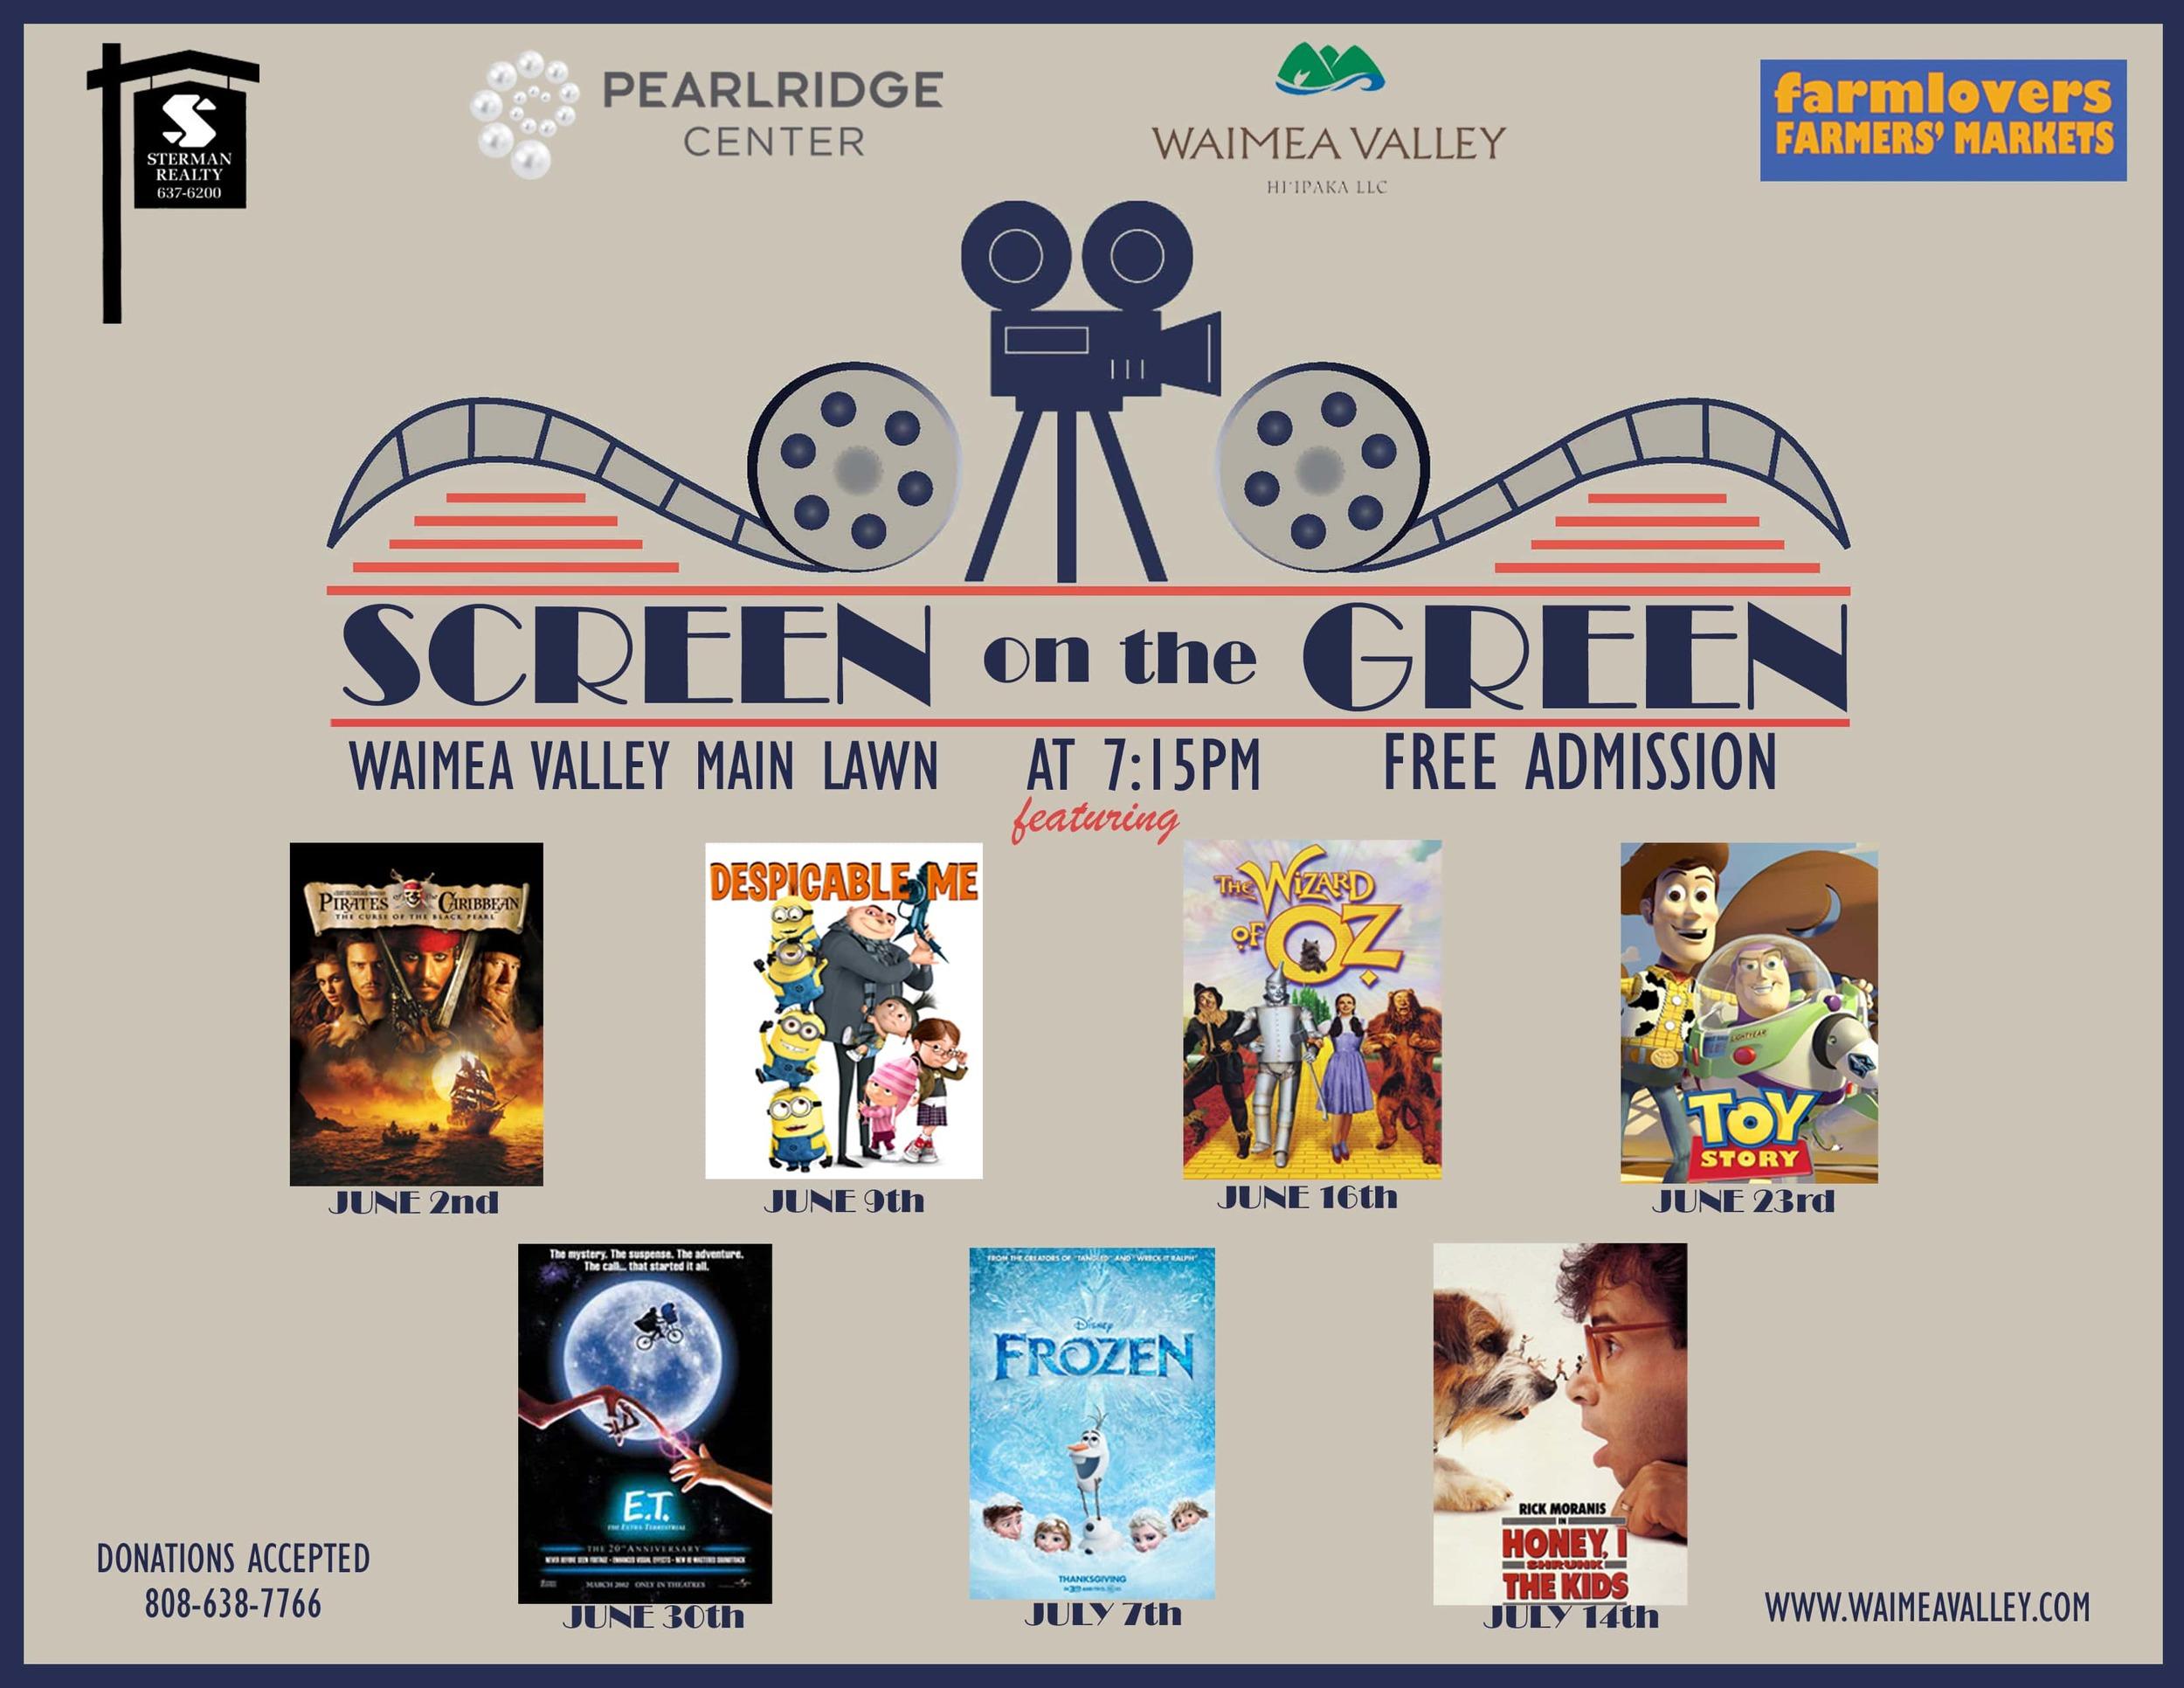 2016Screen_on_the_Green_edited-2-min.jpg